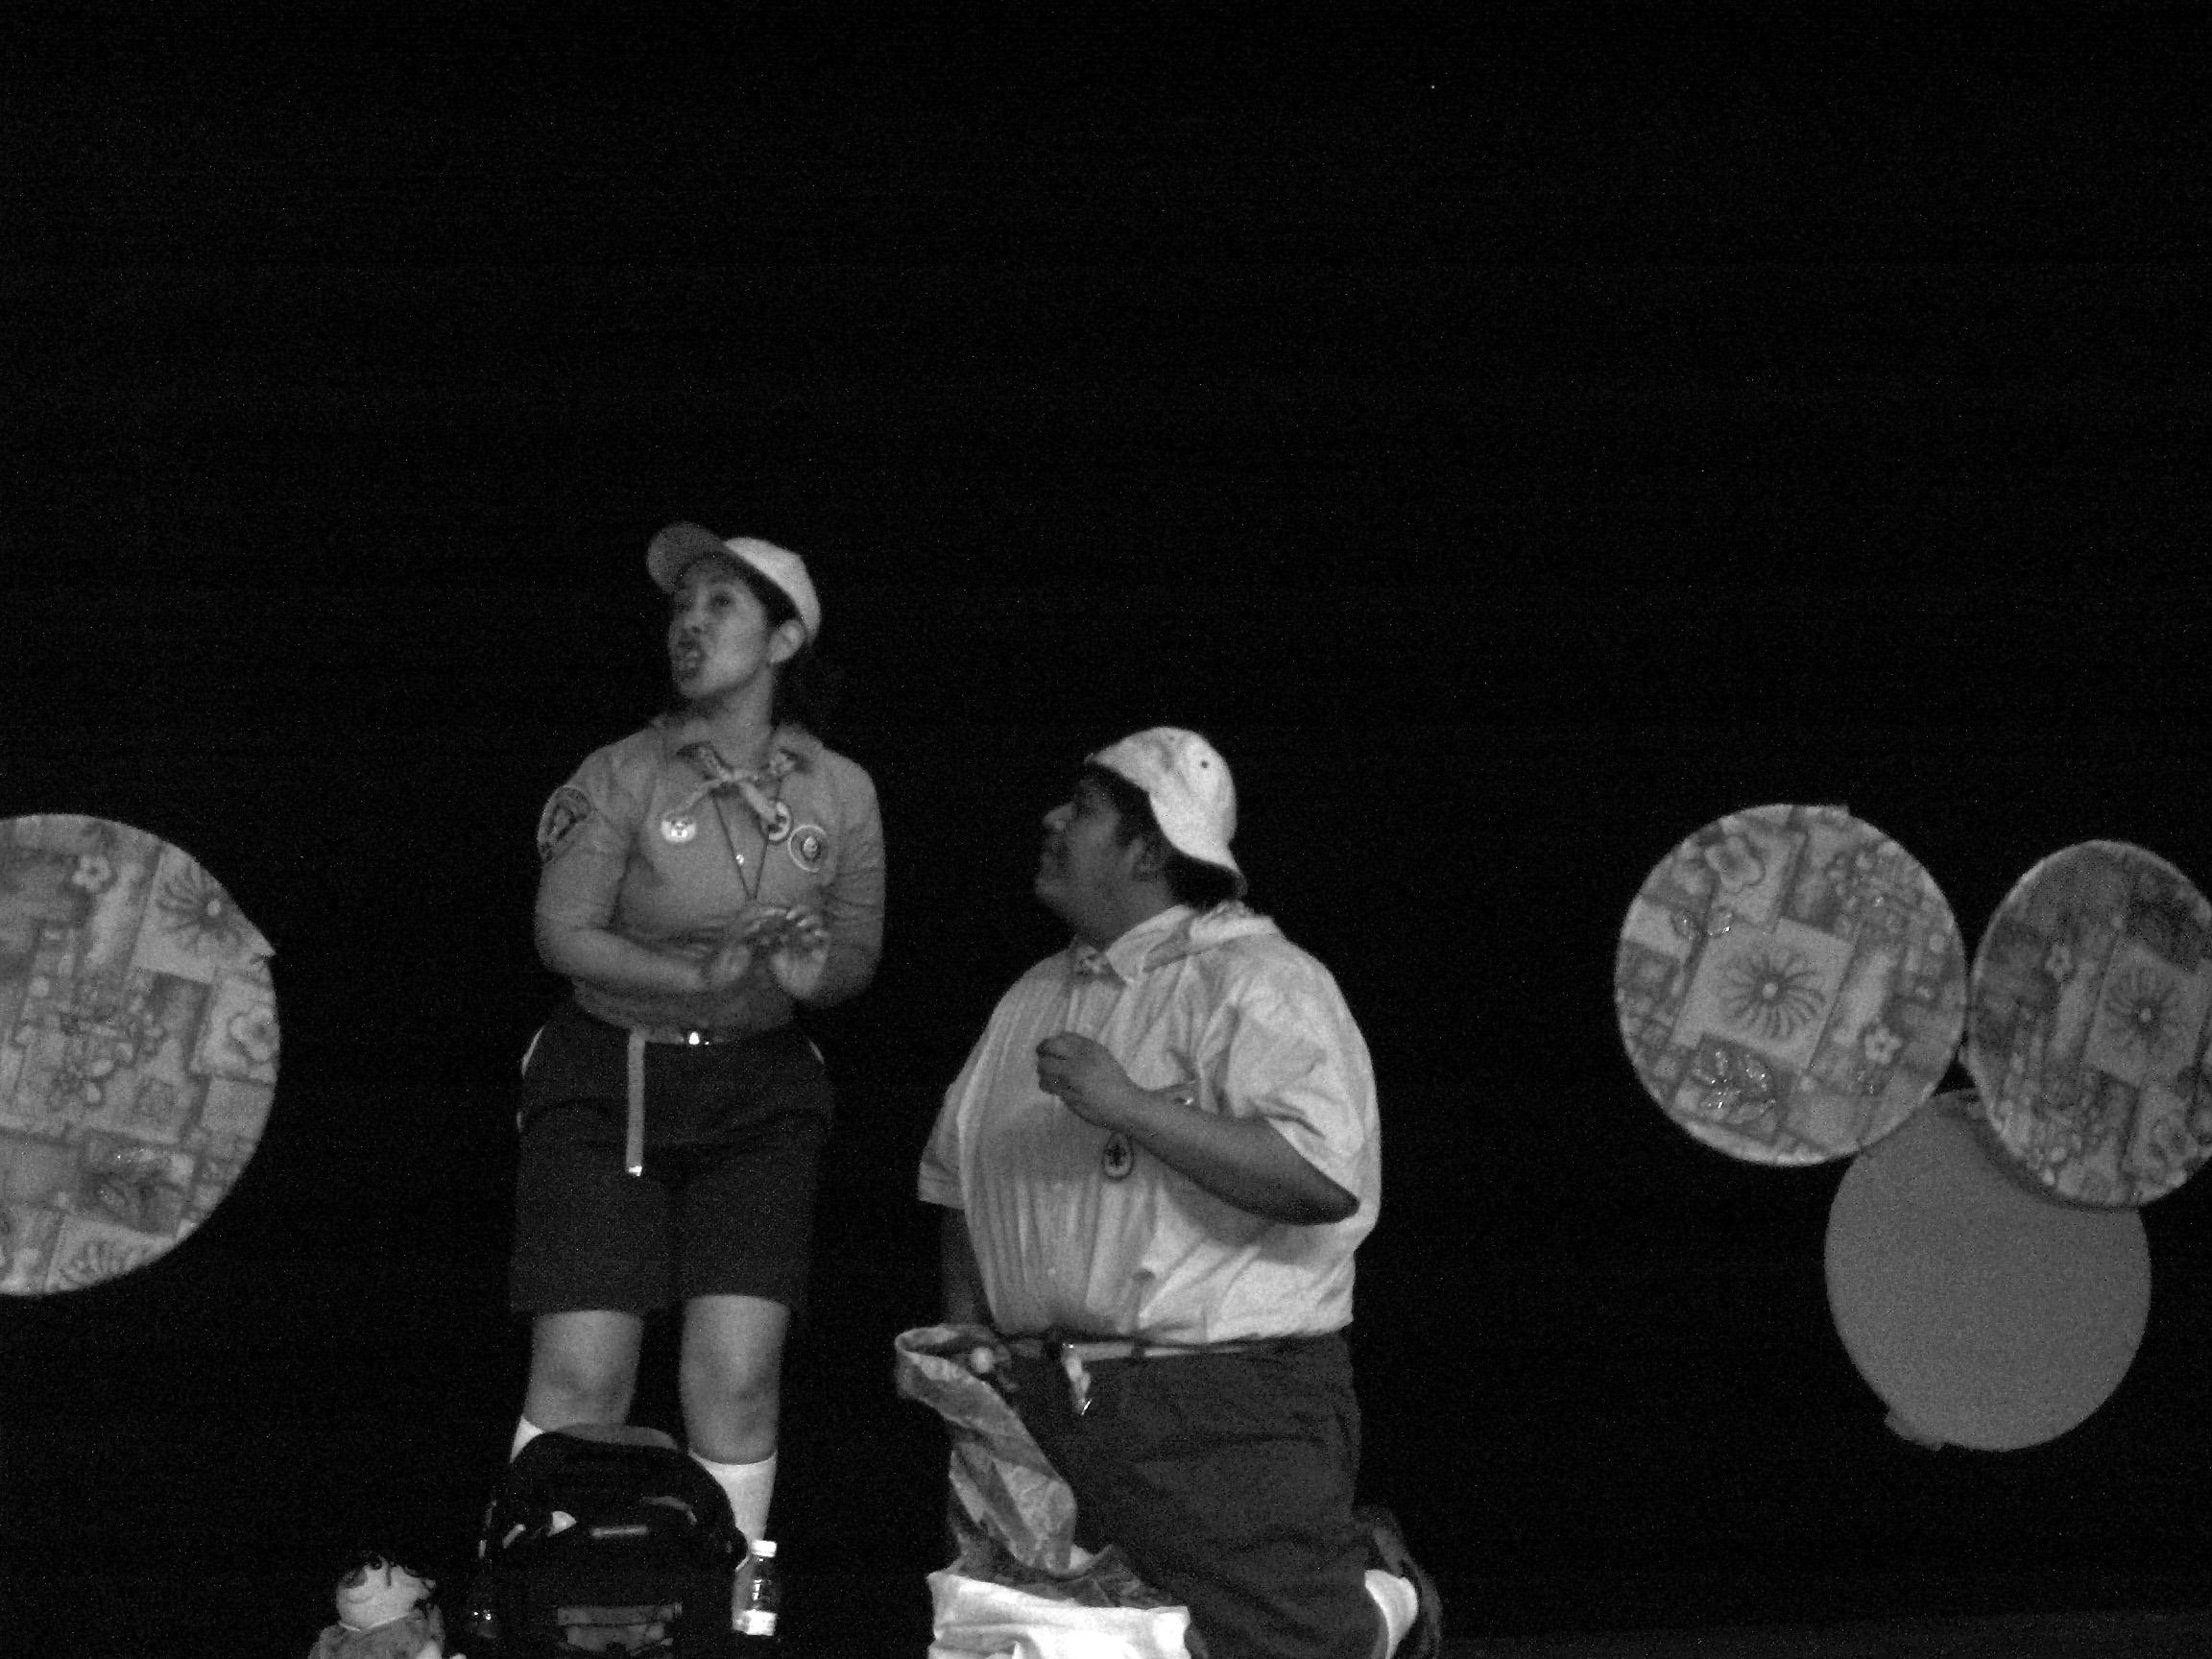 Cahuamanga - Teatro al Desnudo